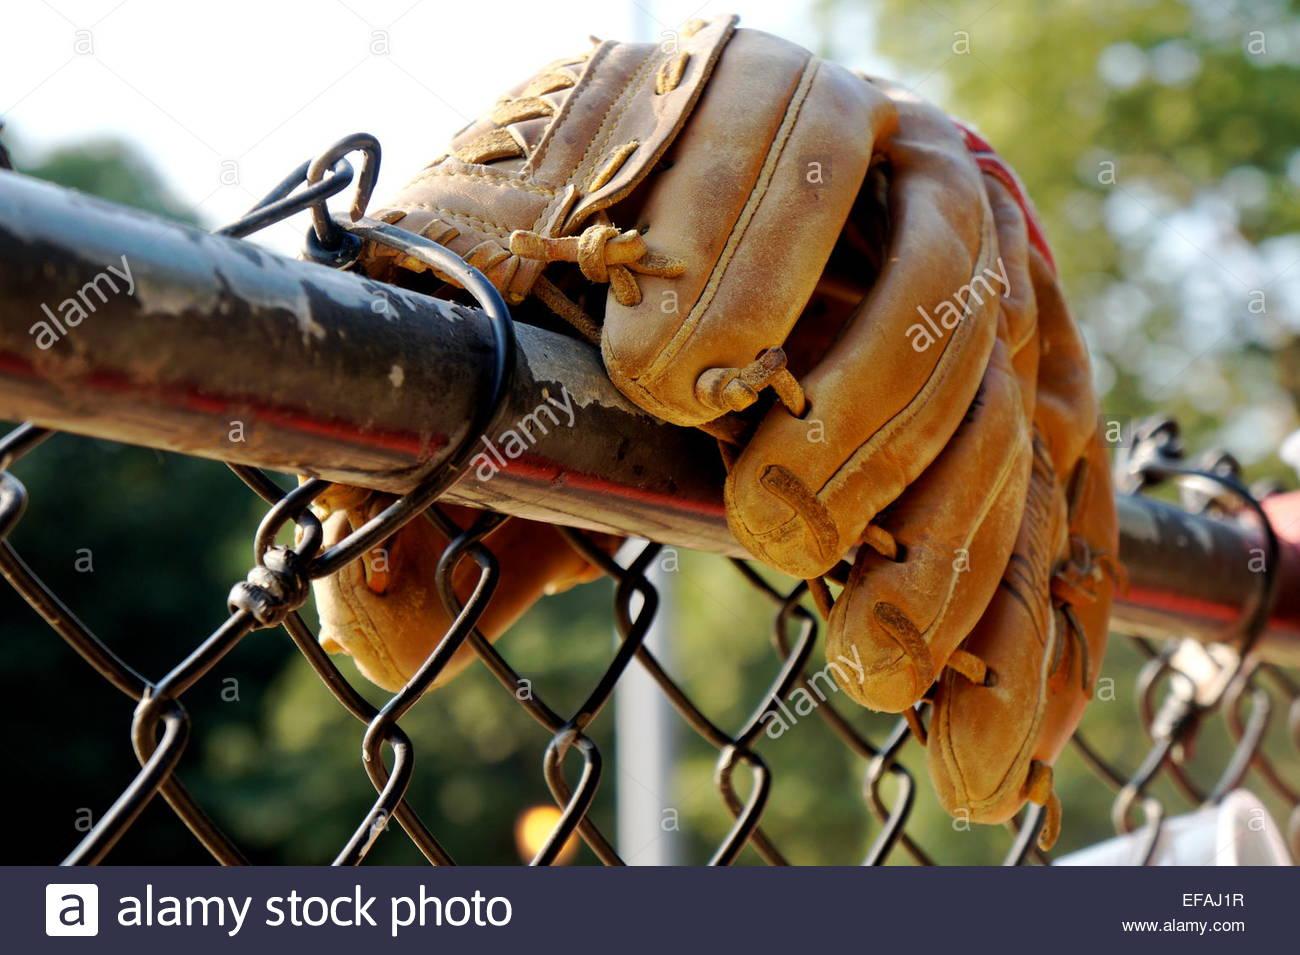 Un guante de béisbol en la barra superior de valla chainlink Imagen De Stock